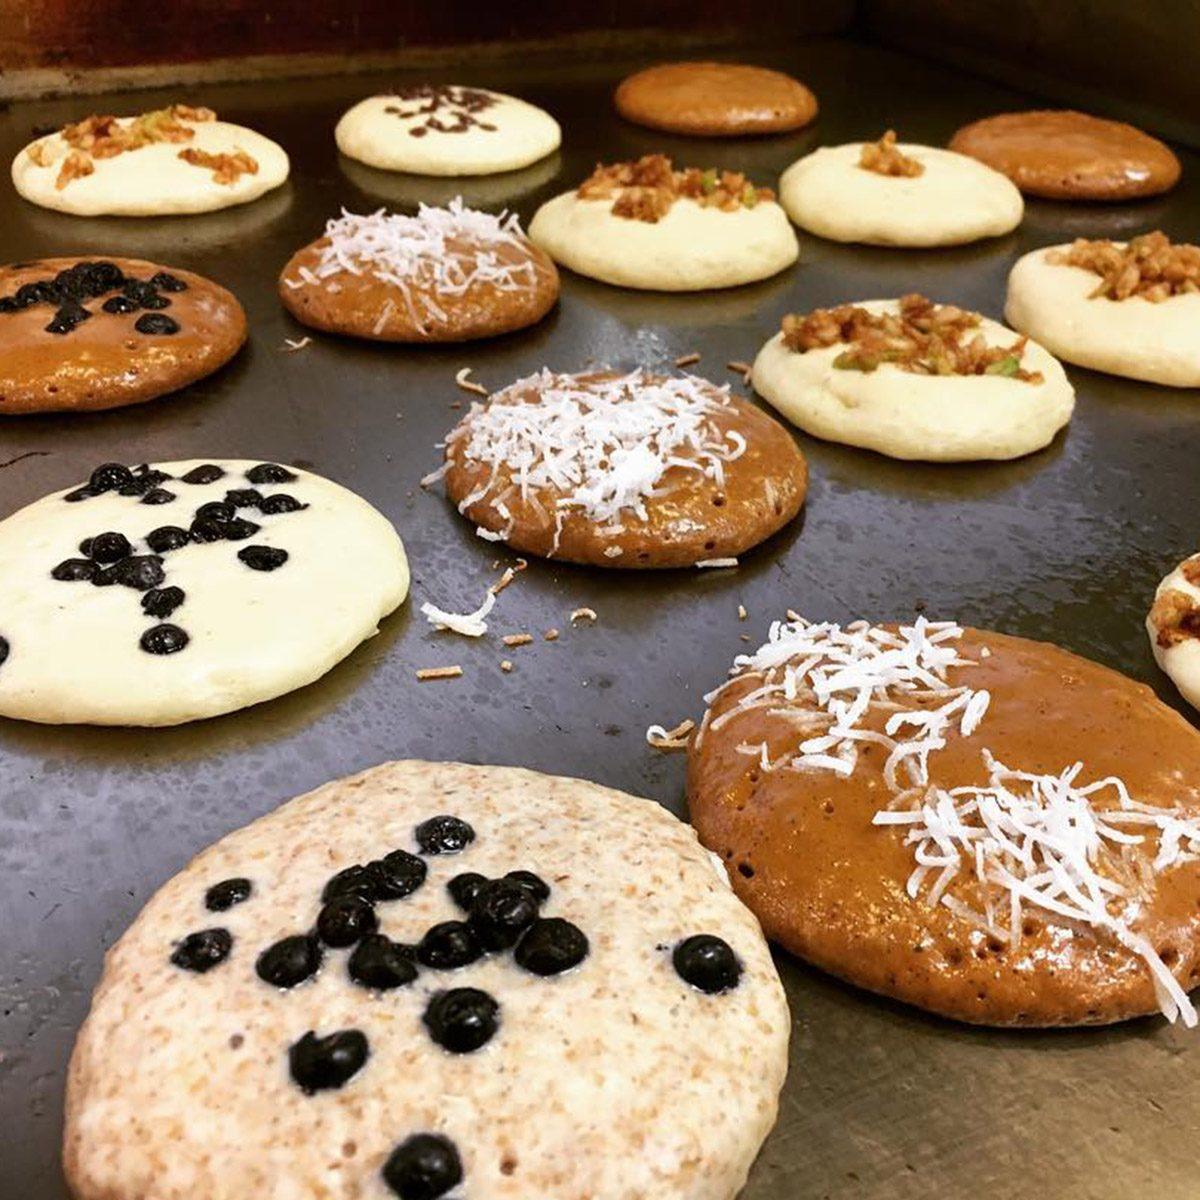 Polly's Pancake Parlor, Sugar Hill pancakes